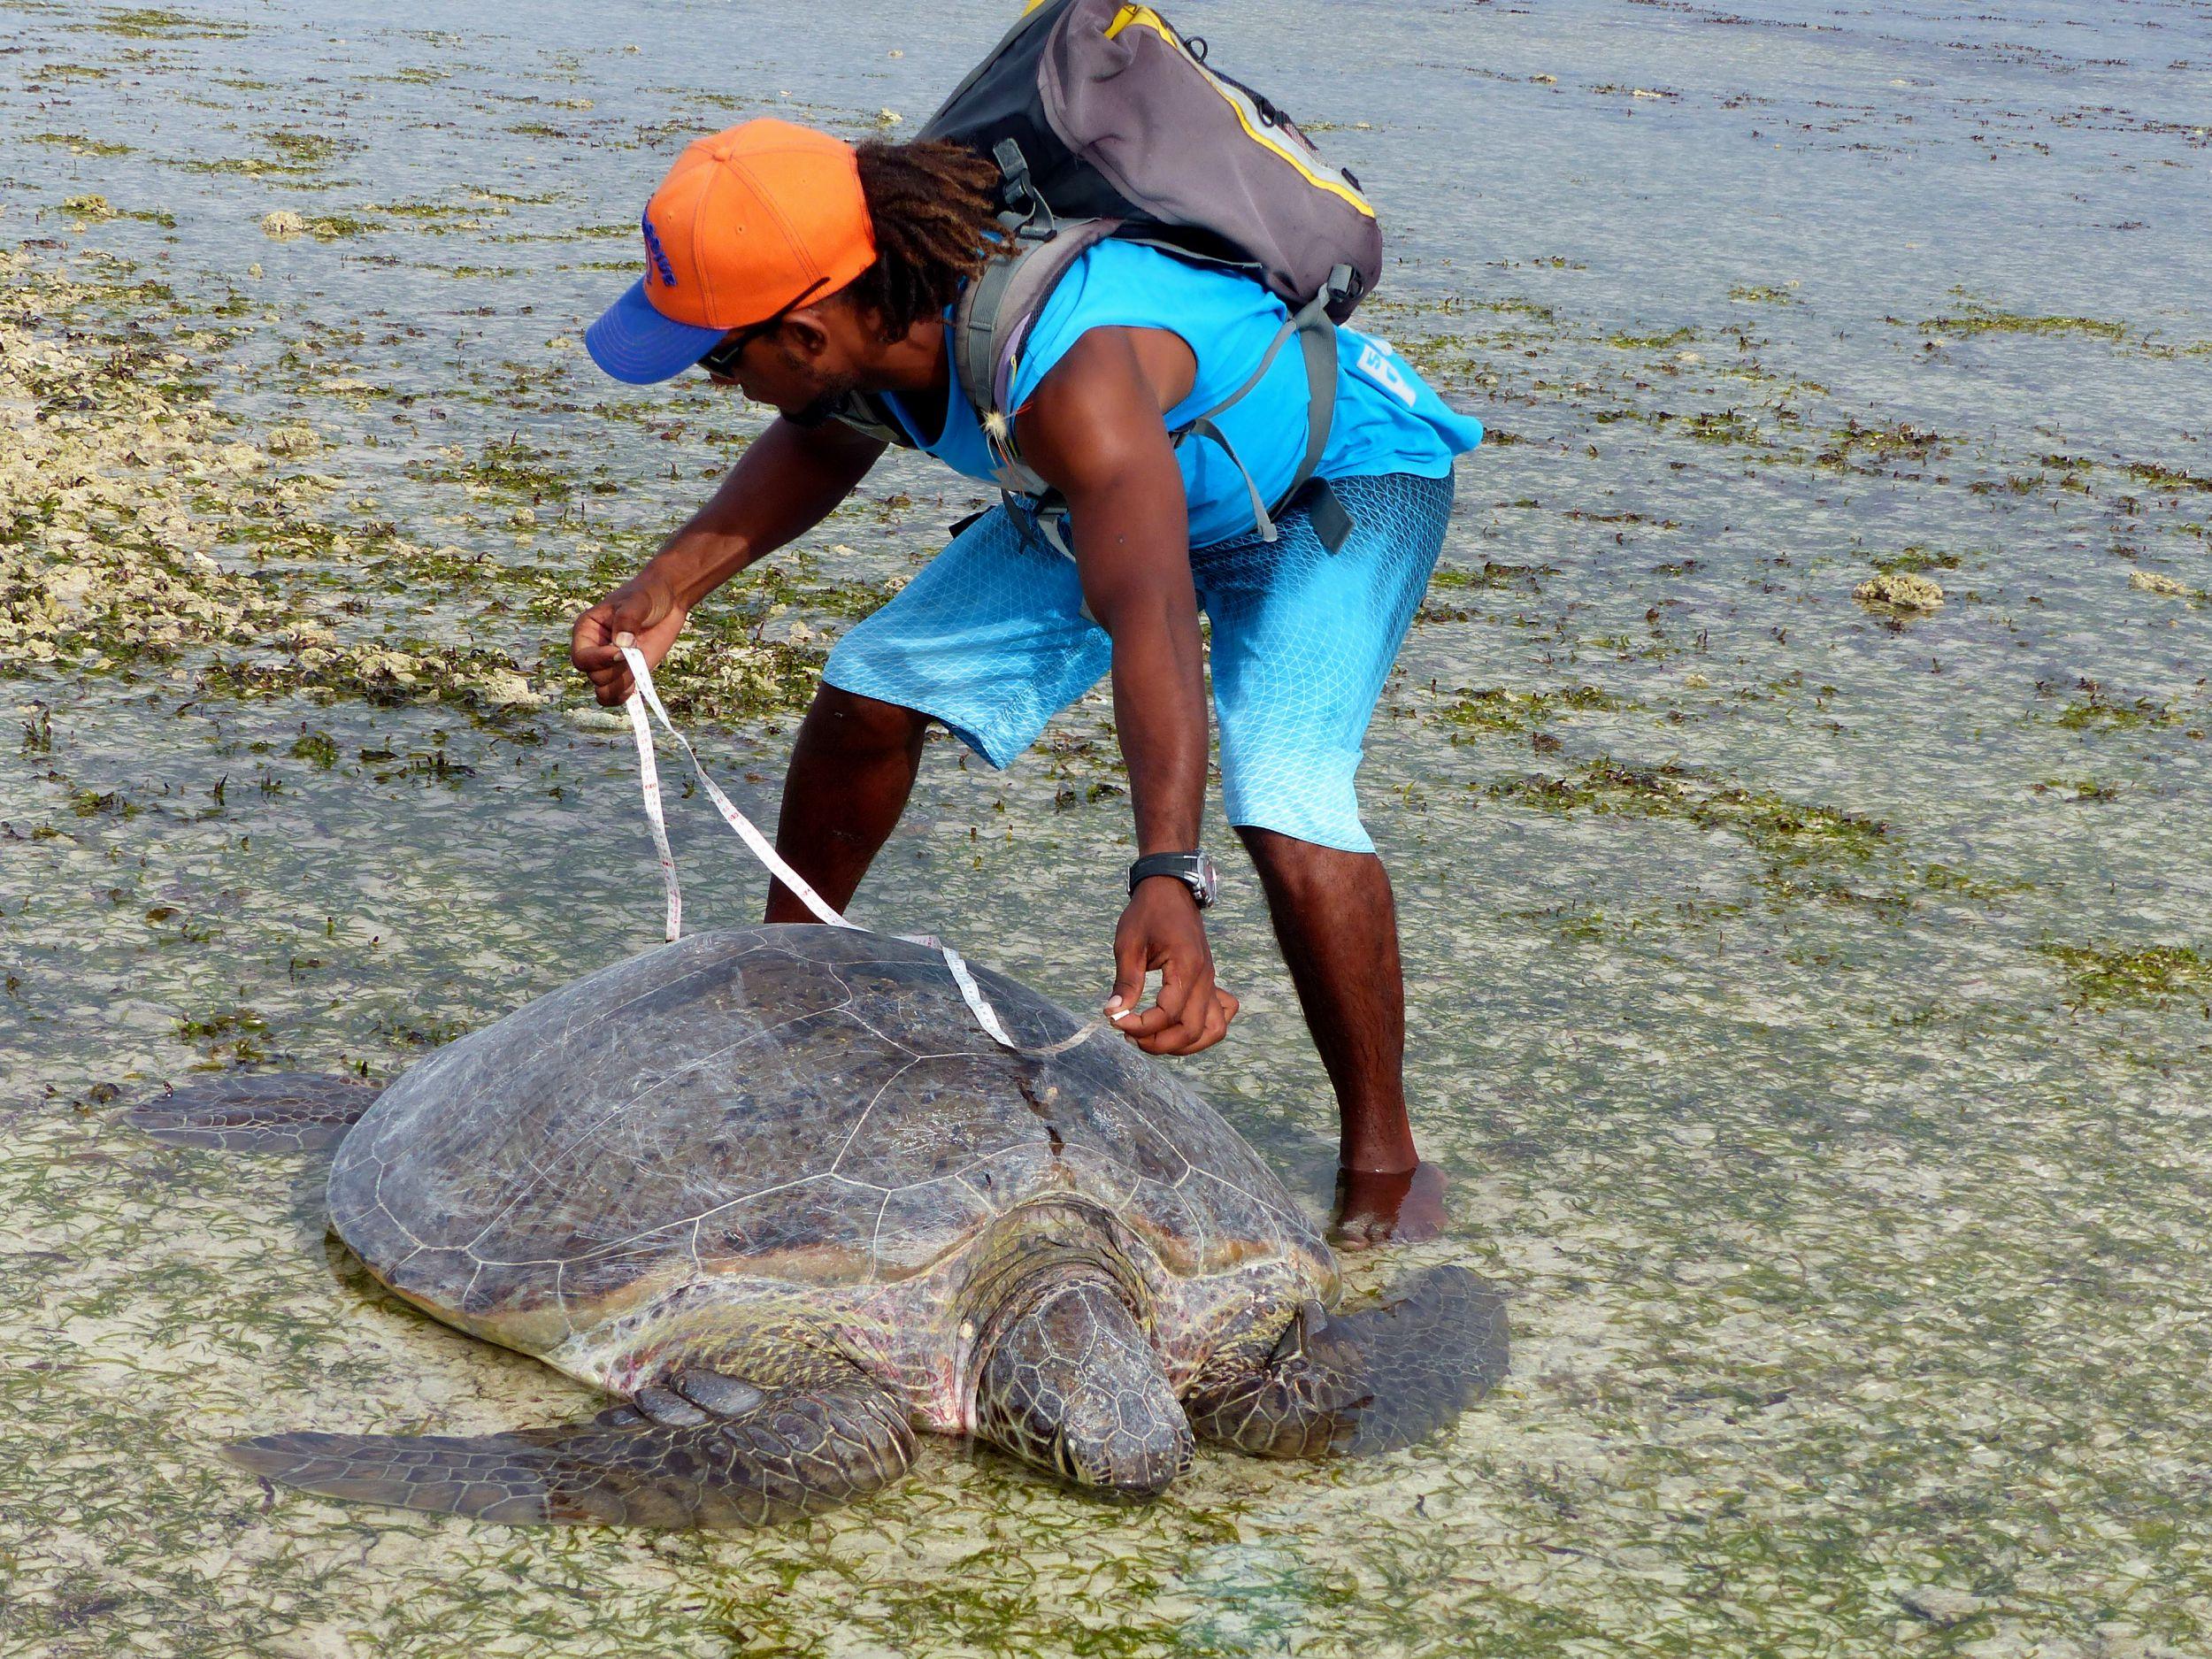 Mesure taille carapace des tortues